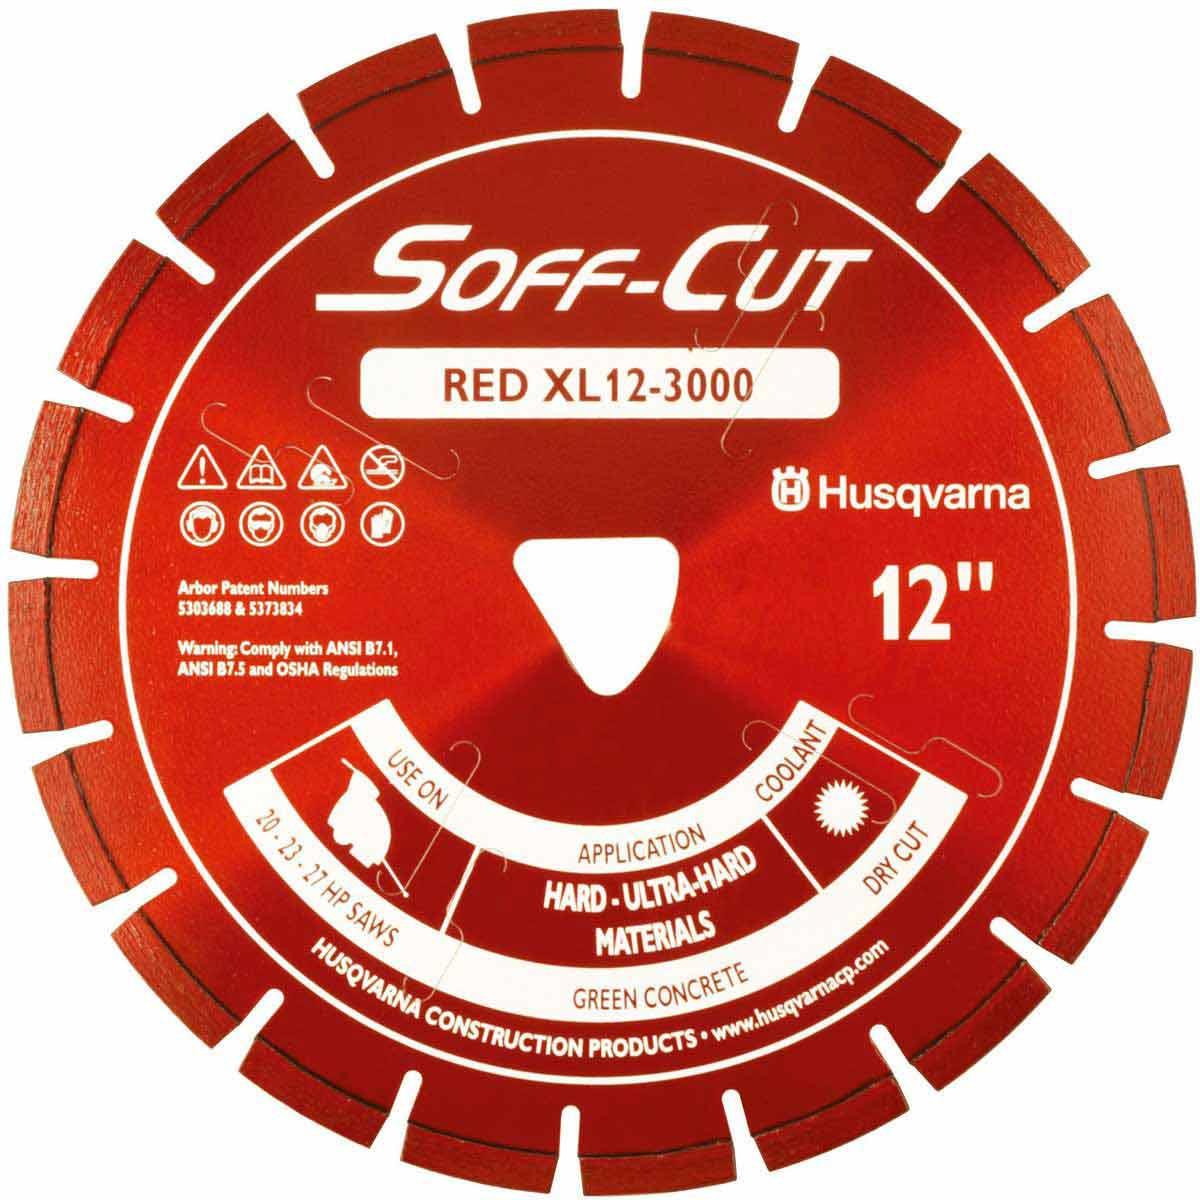 5 inch Husqvarna Soff-Cut Excel 3000